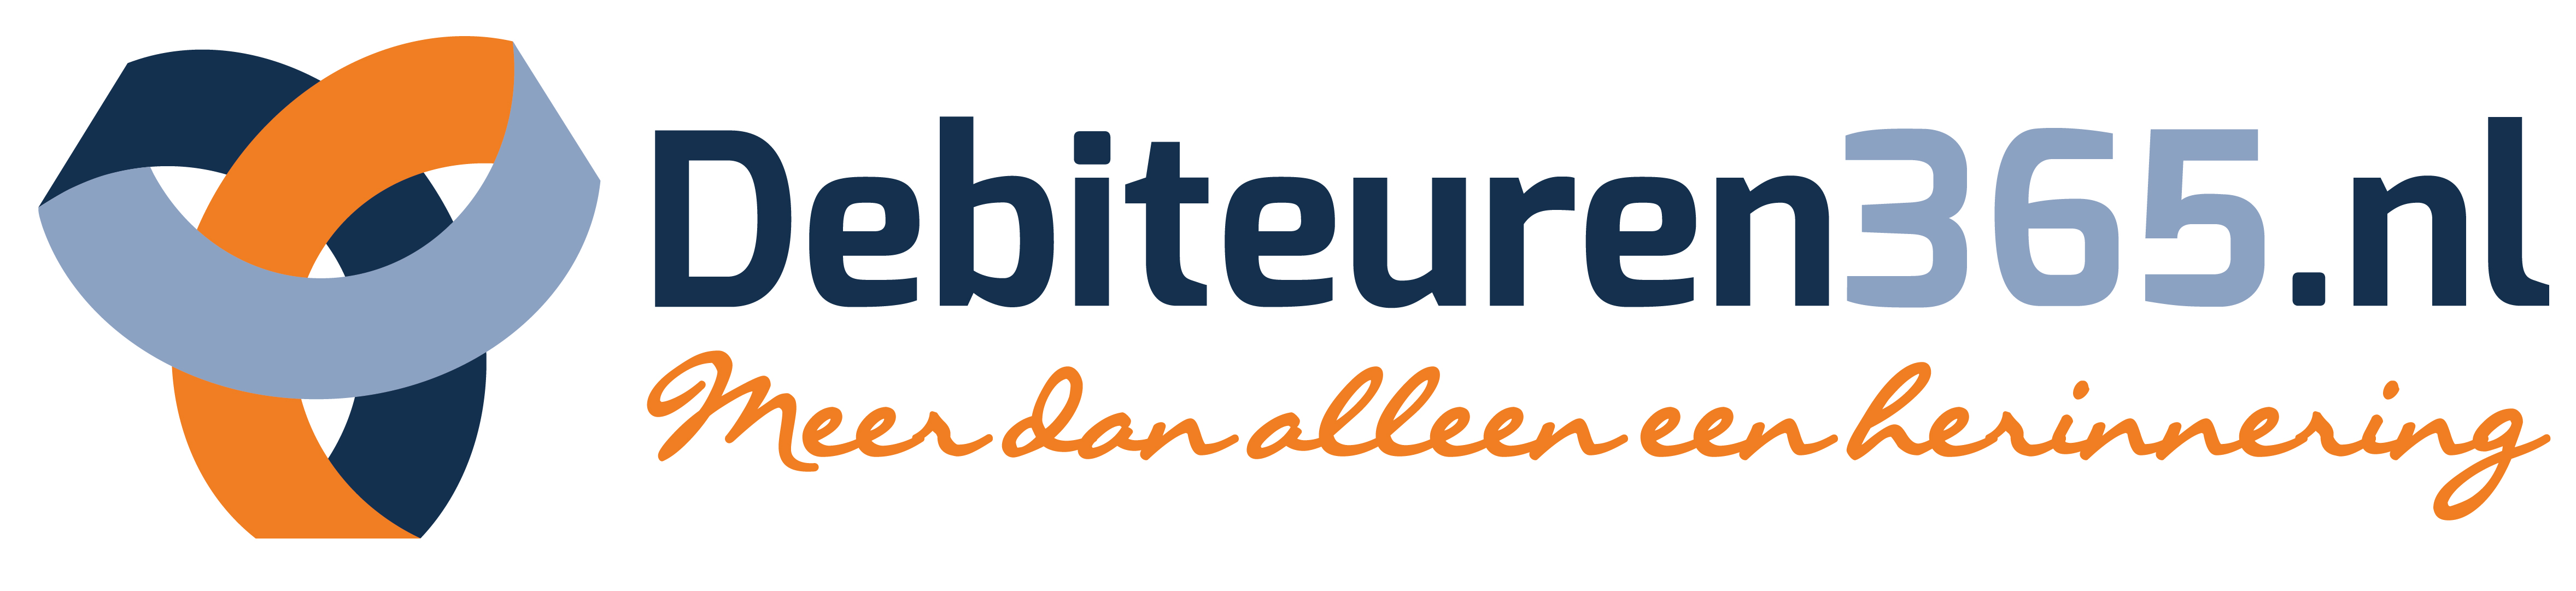 Logo-DEB365-Meer dan herinnering-08 (002)